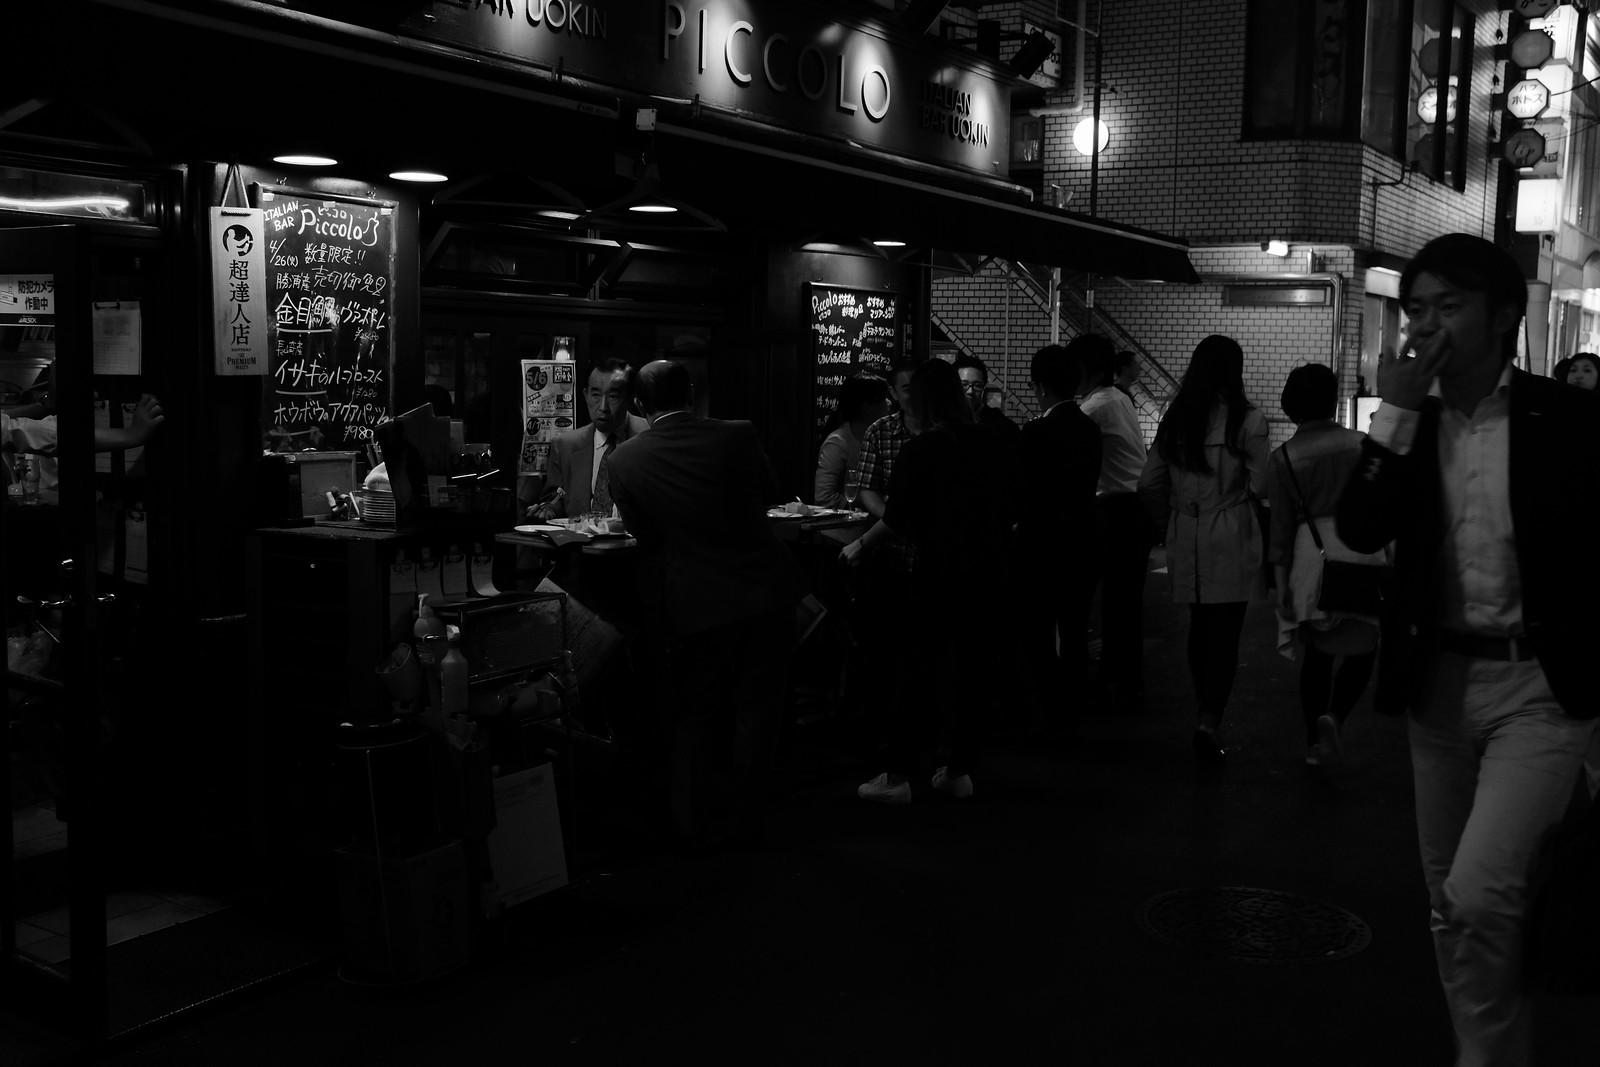 The night Shinbashi in Tokyo, Japan.